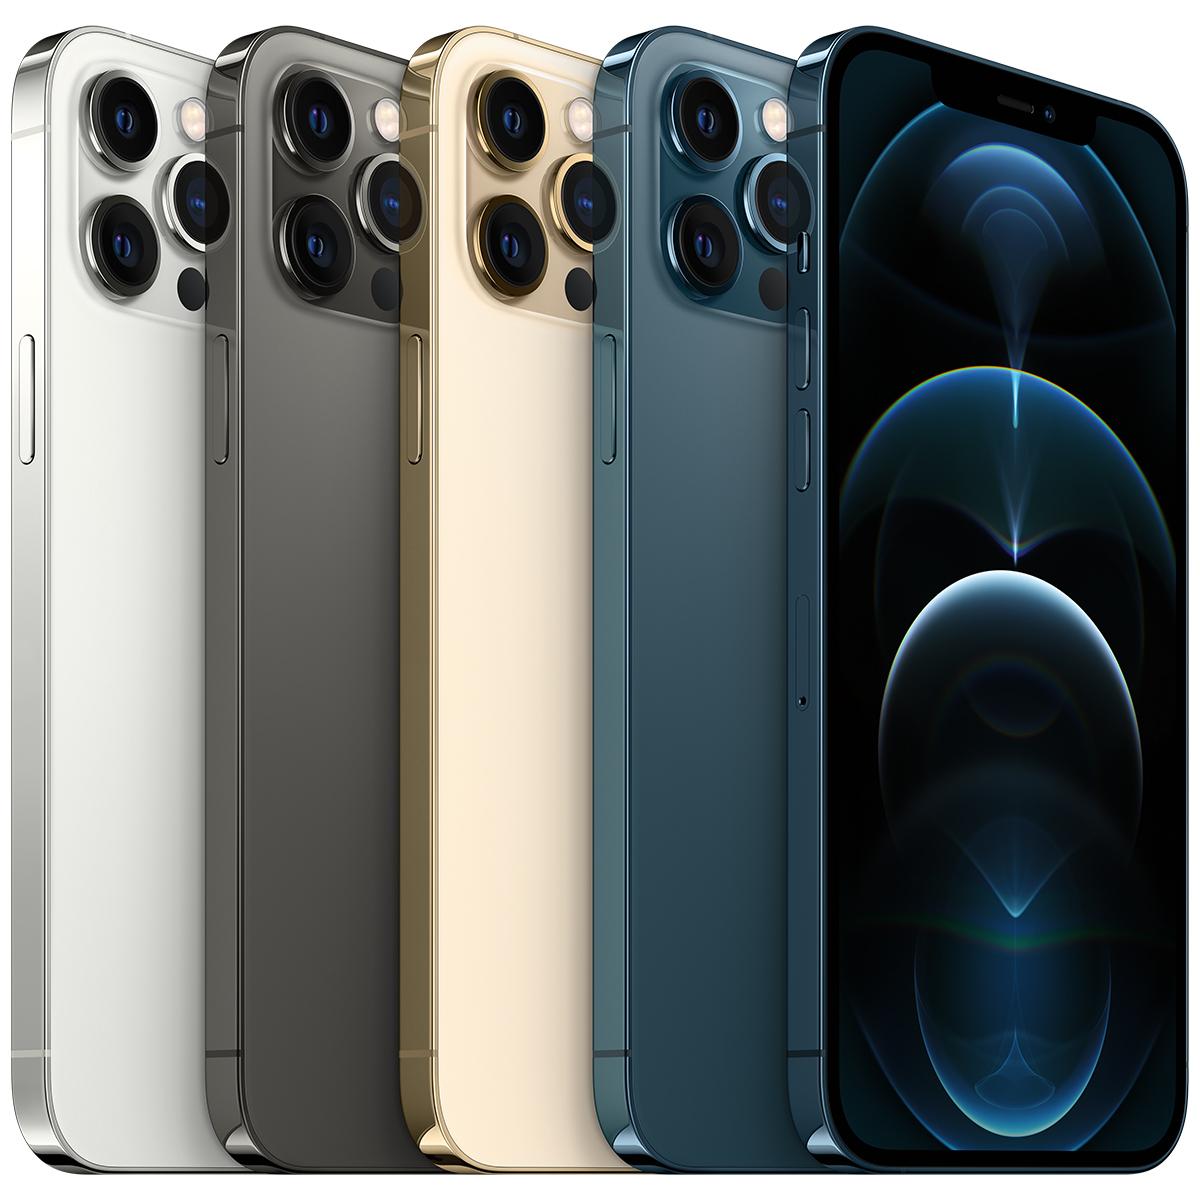 iPhone 12 Pro Max 256GB | Costco Australia